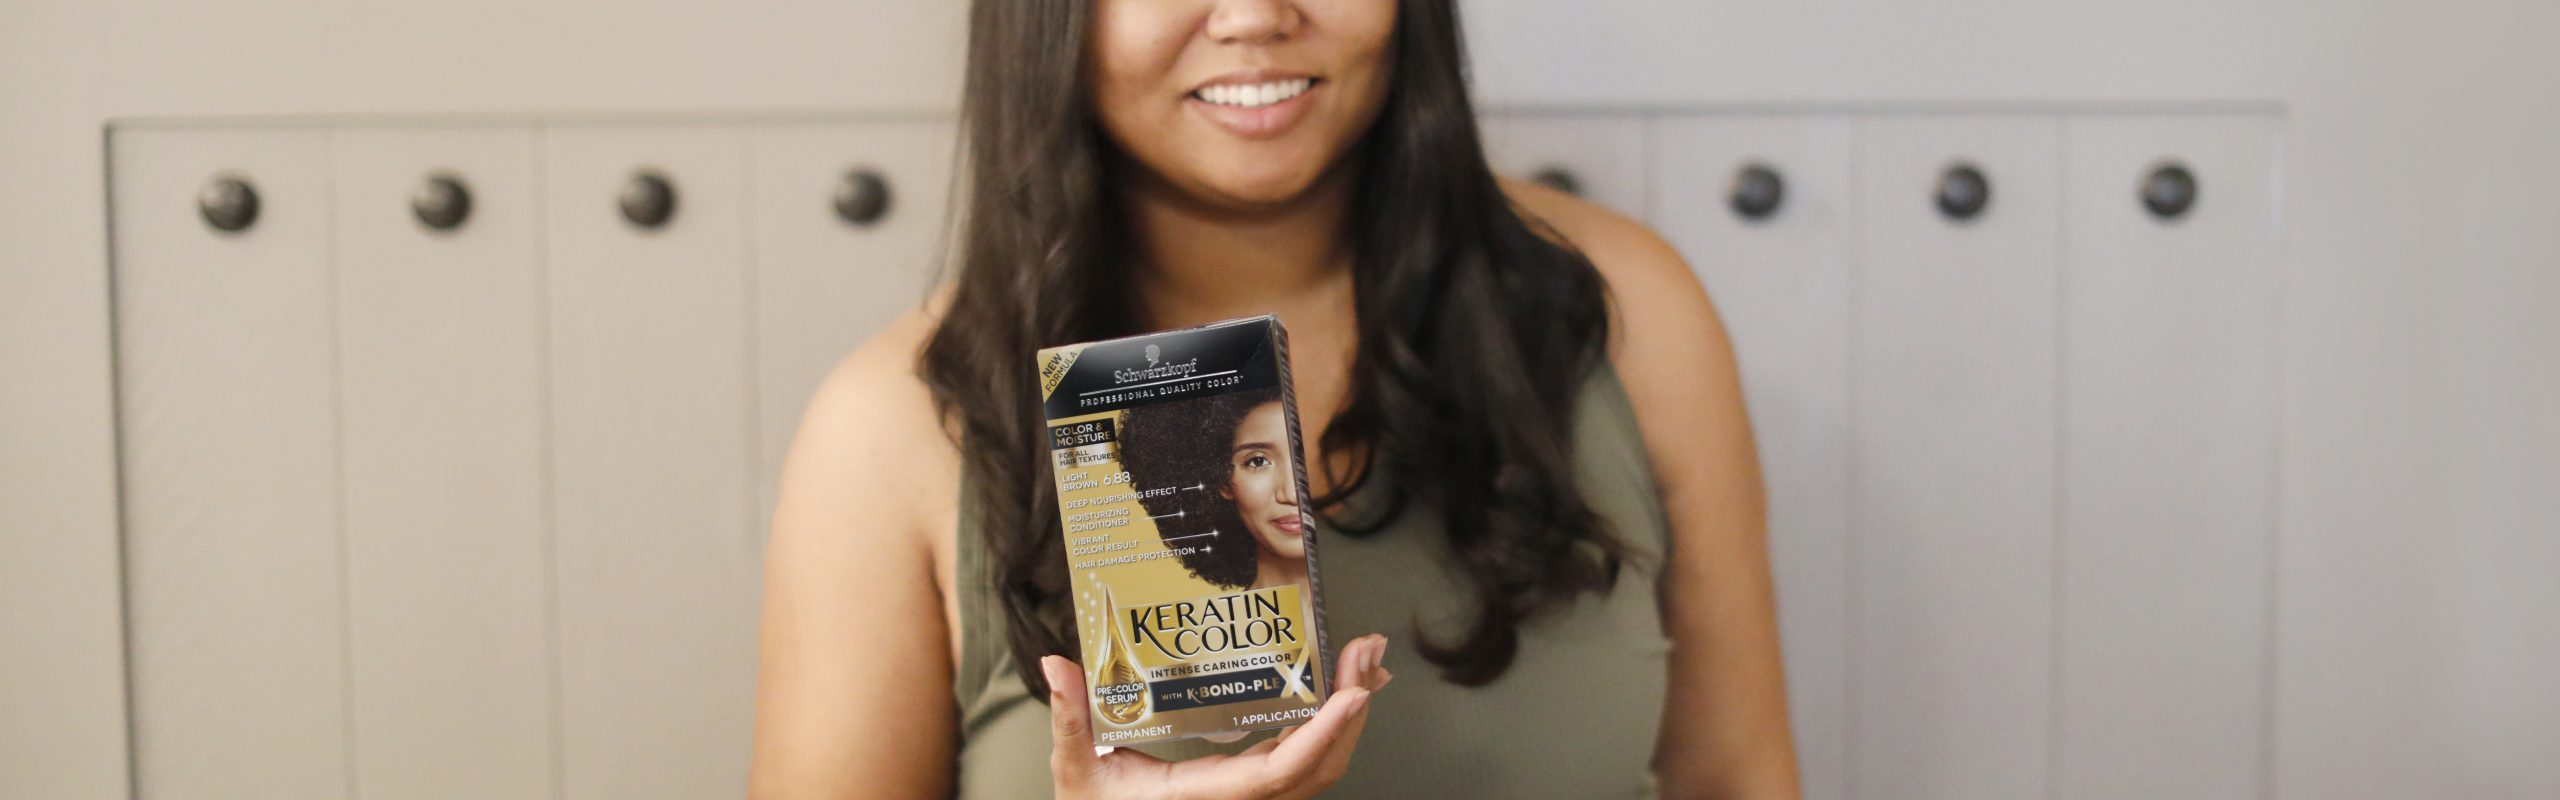 woman holding keratin color box